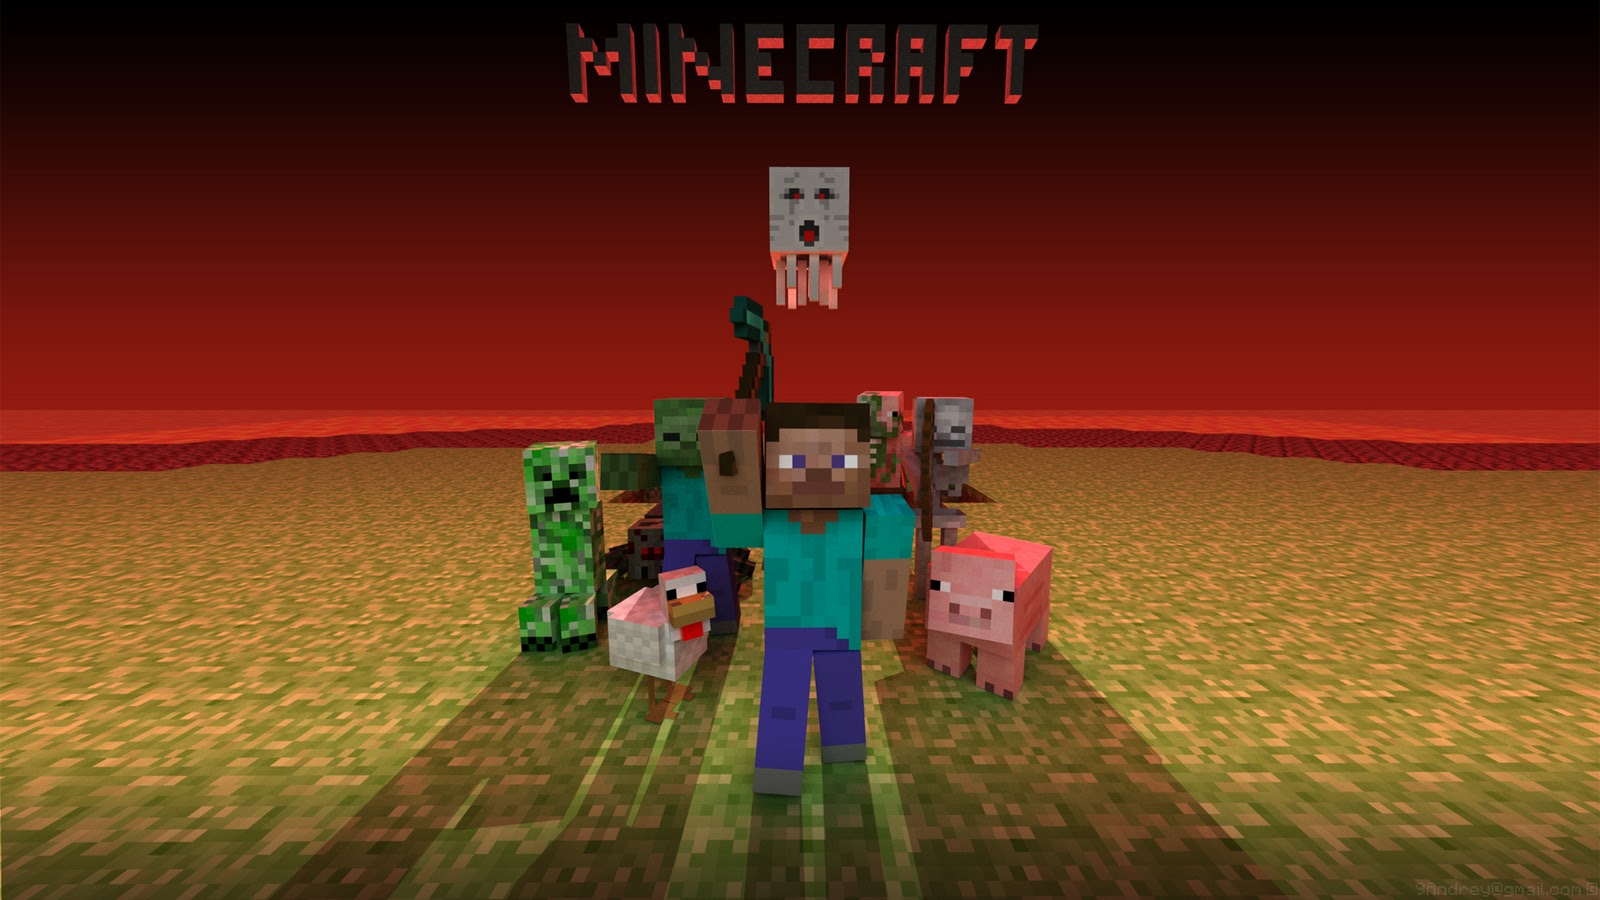 http://4.bp.blogspot.com/-PW_c7Ut0SKY/TqsIhhIxriI/AAAAAAAAAfg/6ZNq_xx_swA/s1600/Minecraft+Wallpaper+HD+1920x1080+3.jpg